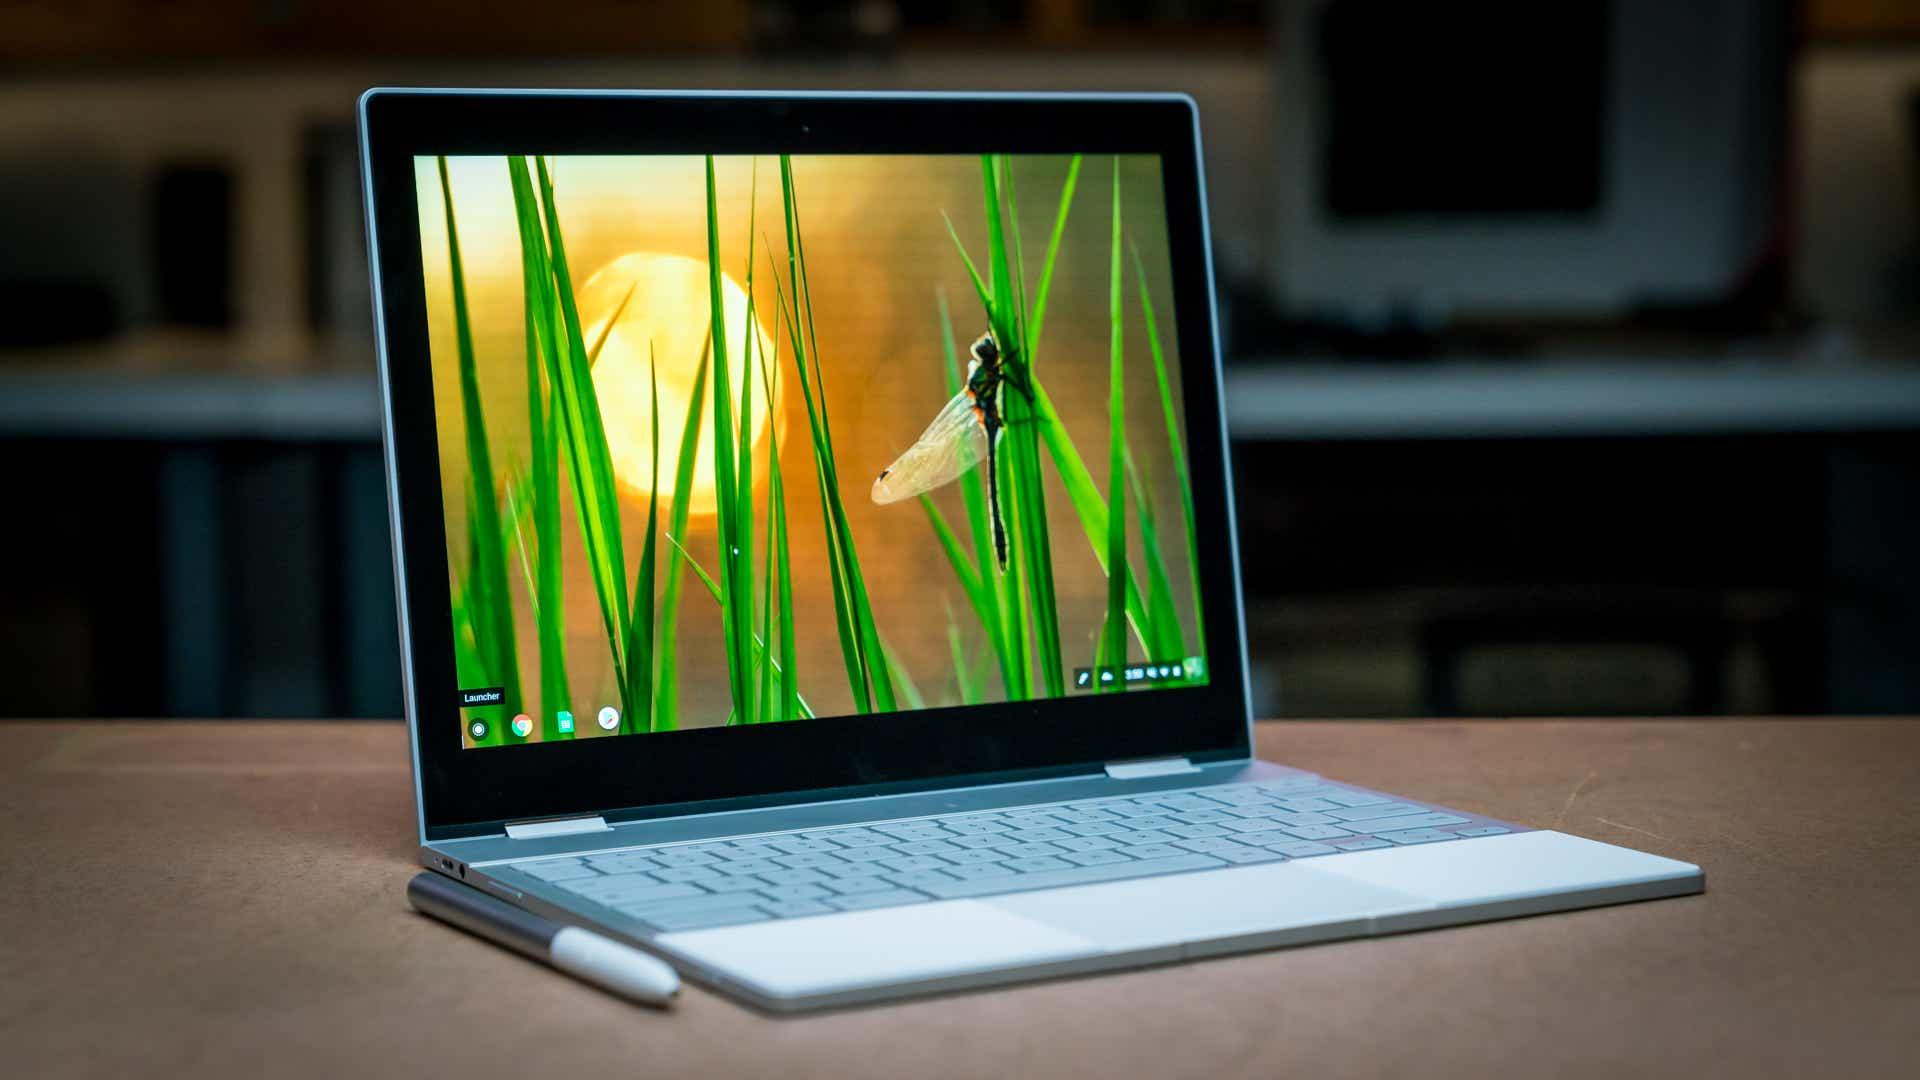 Pixelbook (Core i5, 8GB RAM, 256GB eMMC)